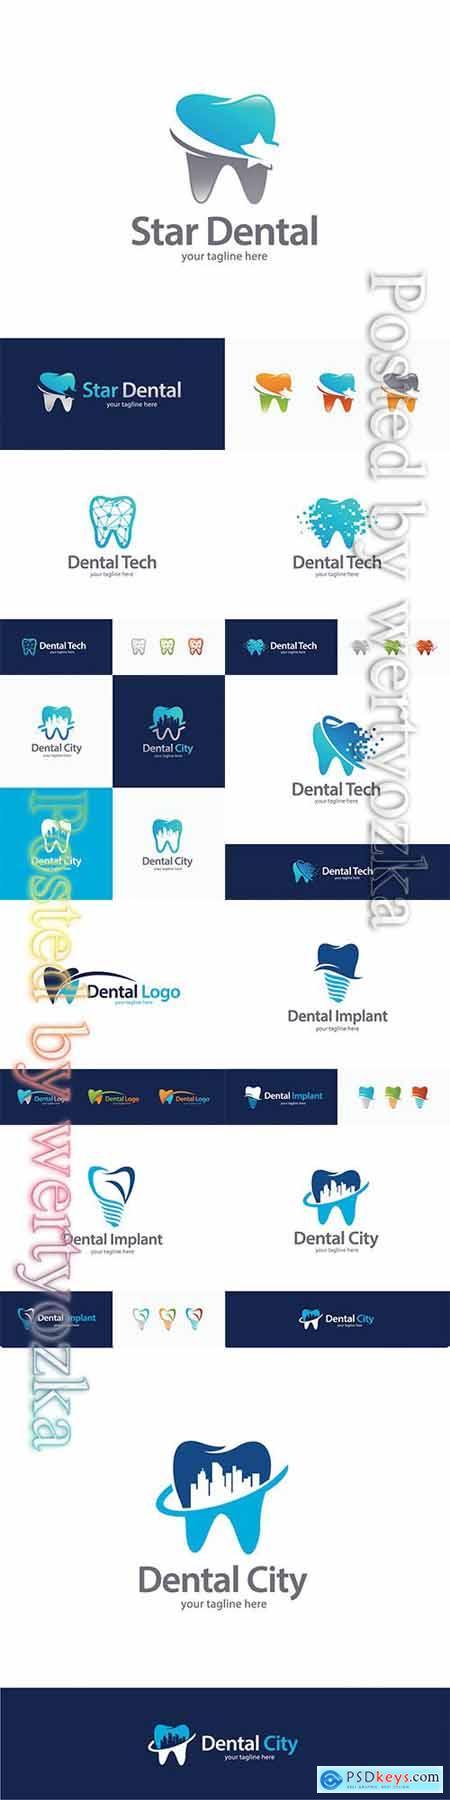 Dental logo collection vector illustration